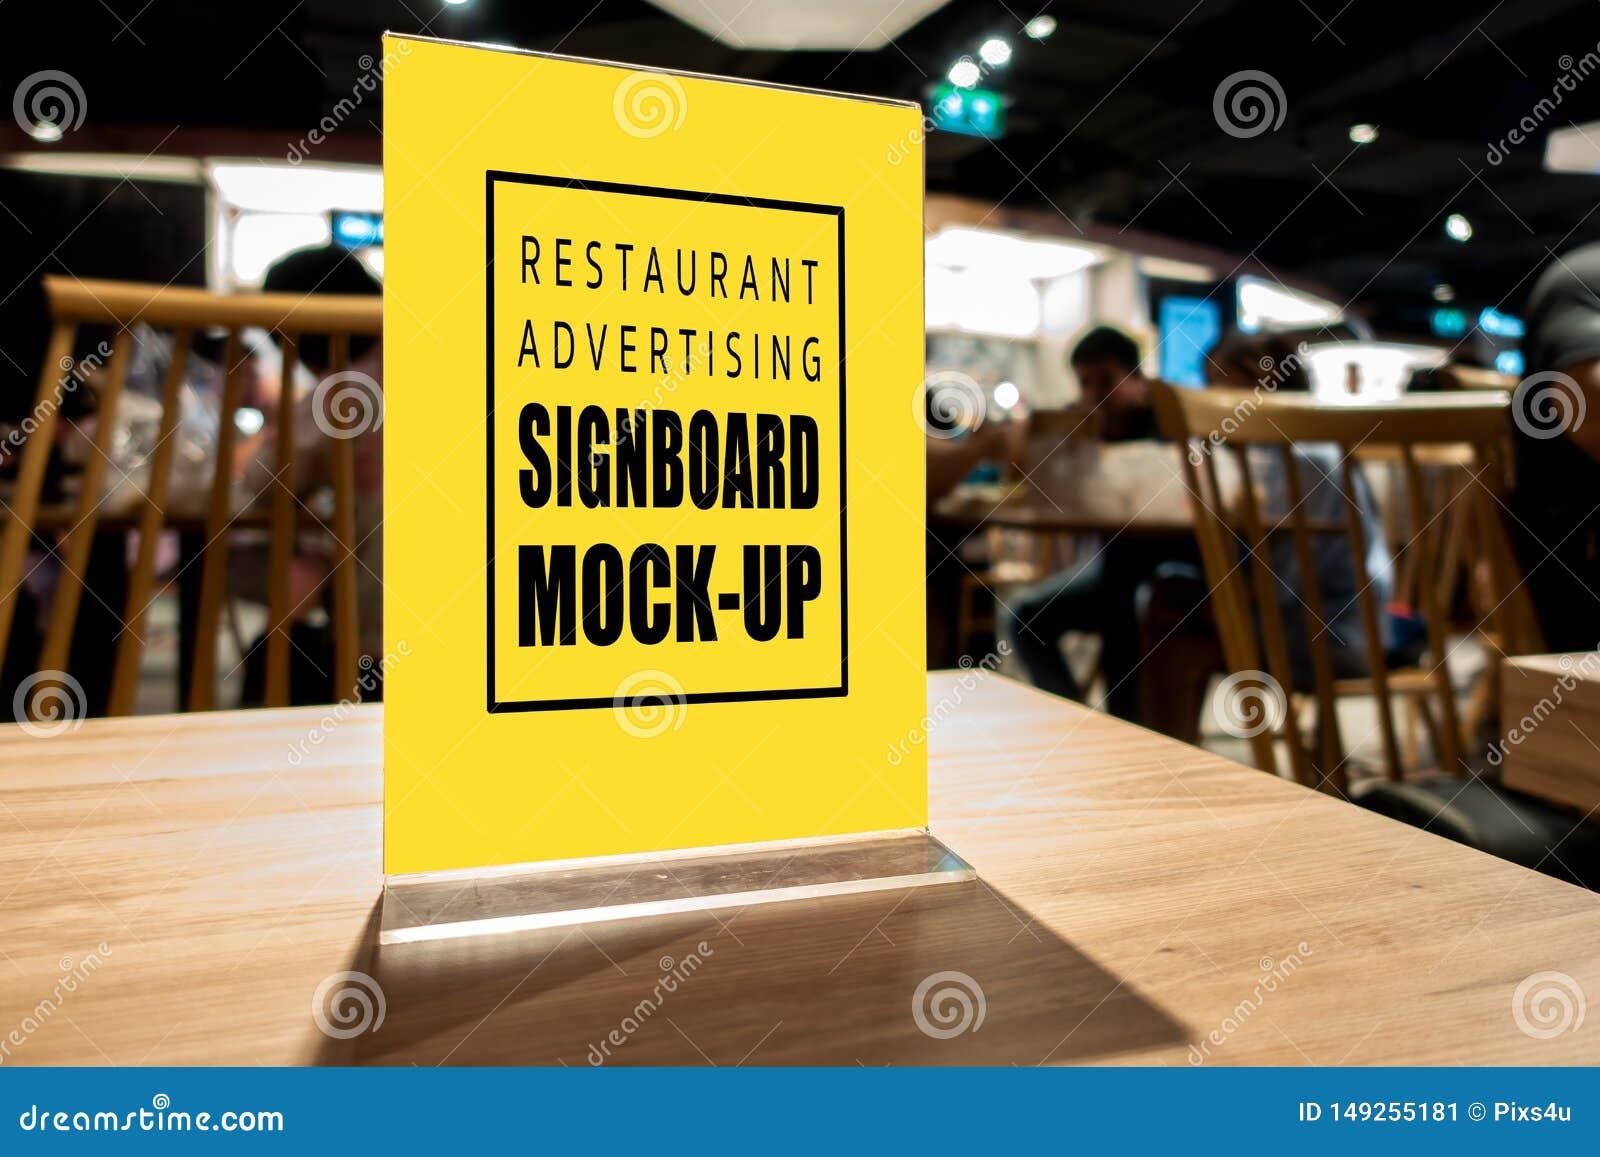 Mock Up Vertical Advertising Signboard Acrylic Frame In Restaurant